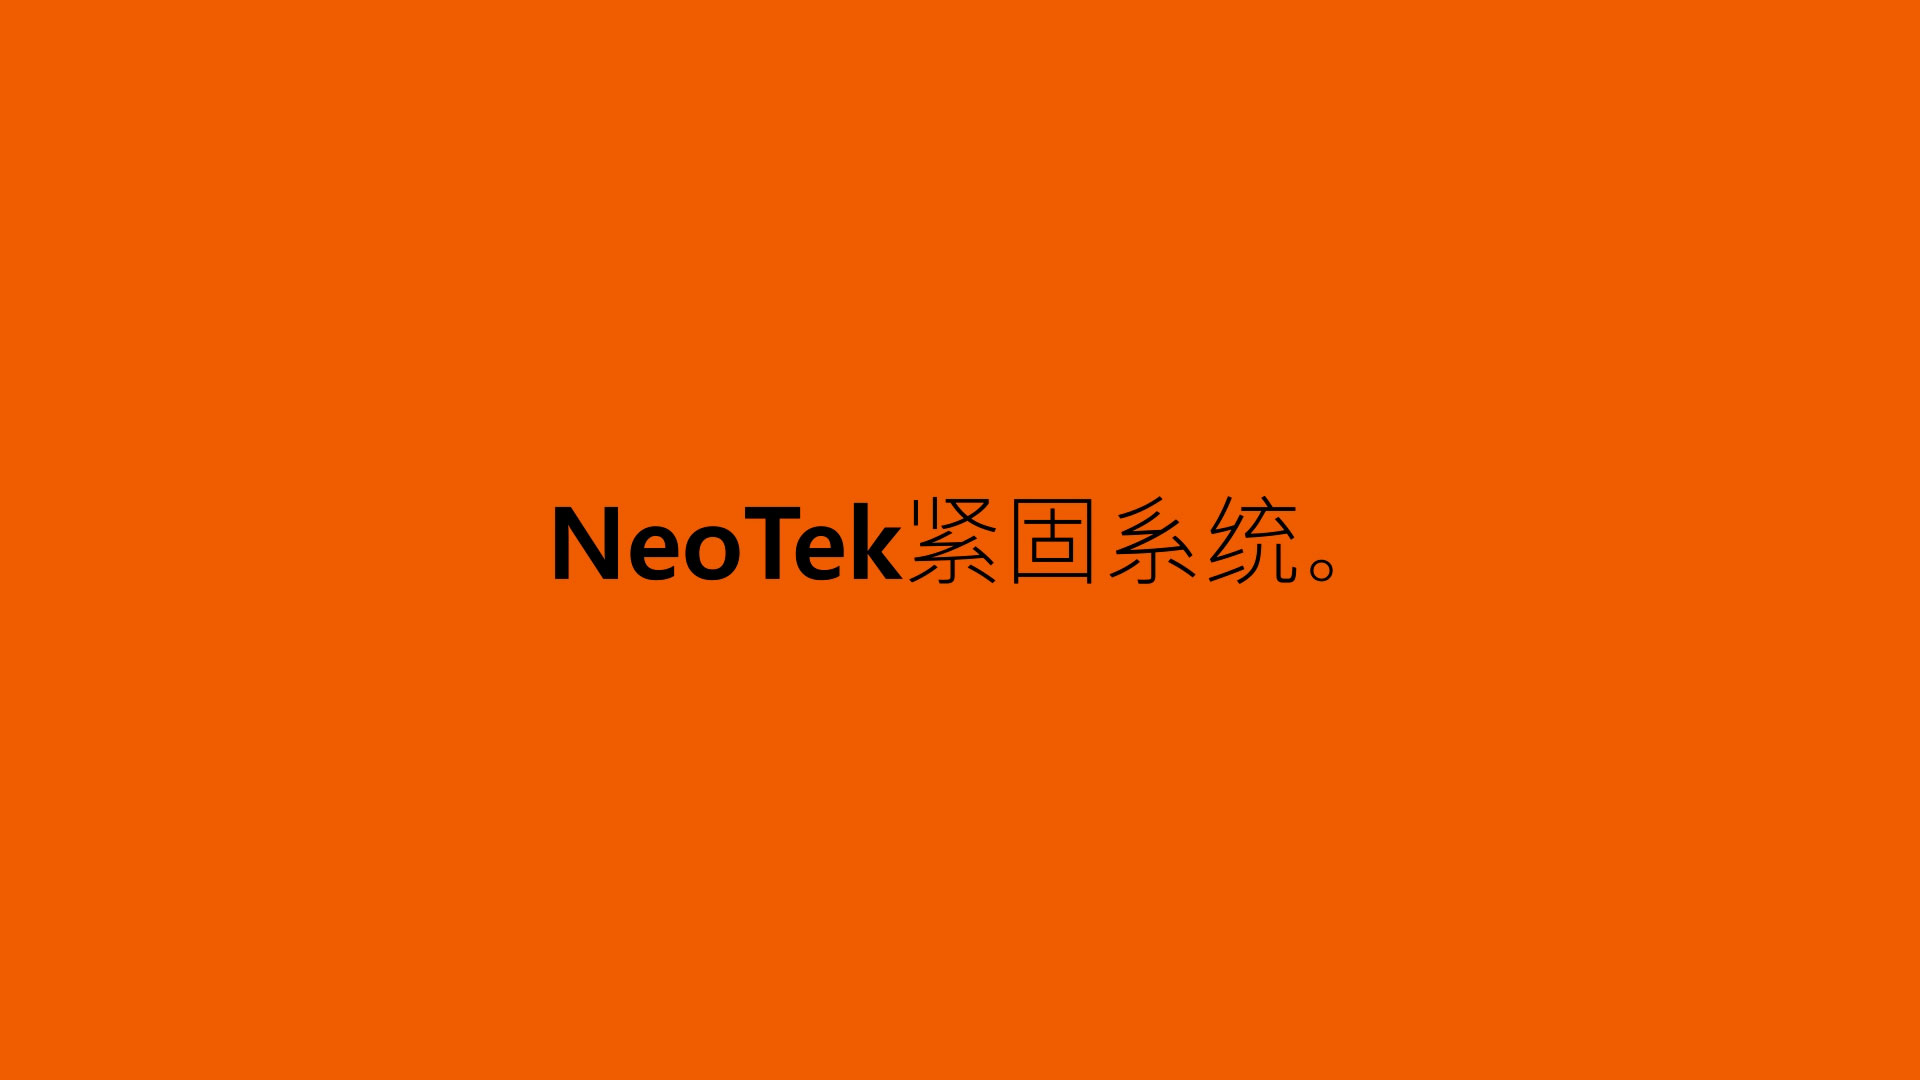 NeoTek-10